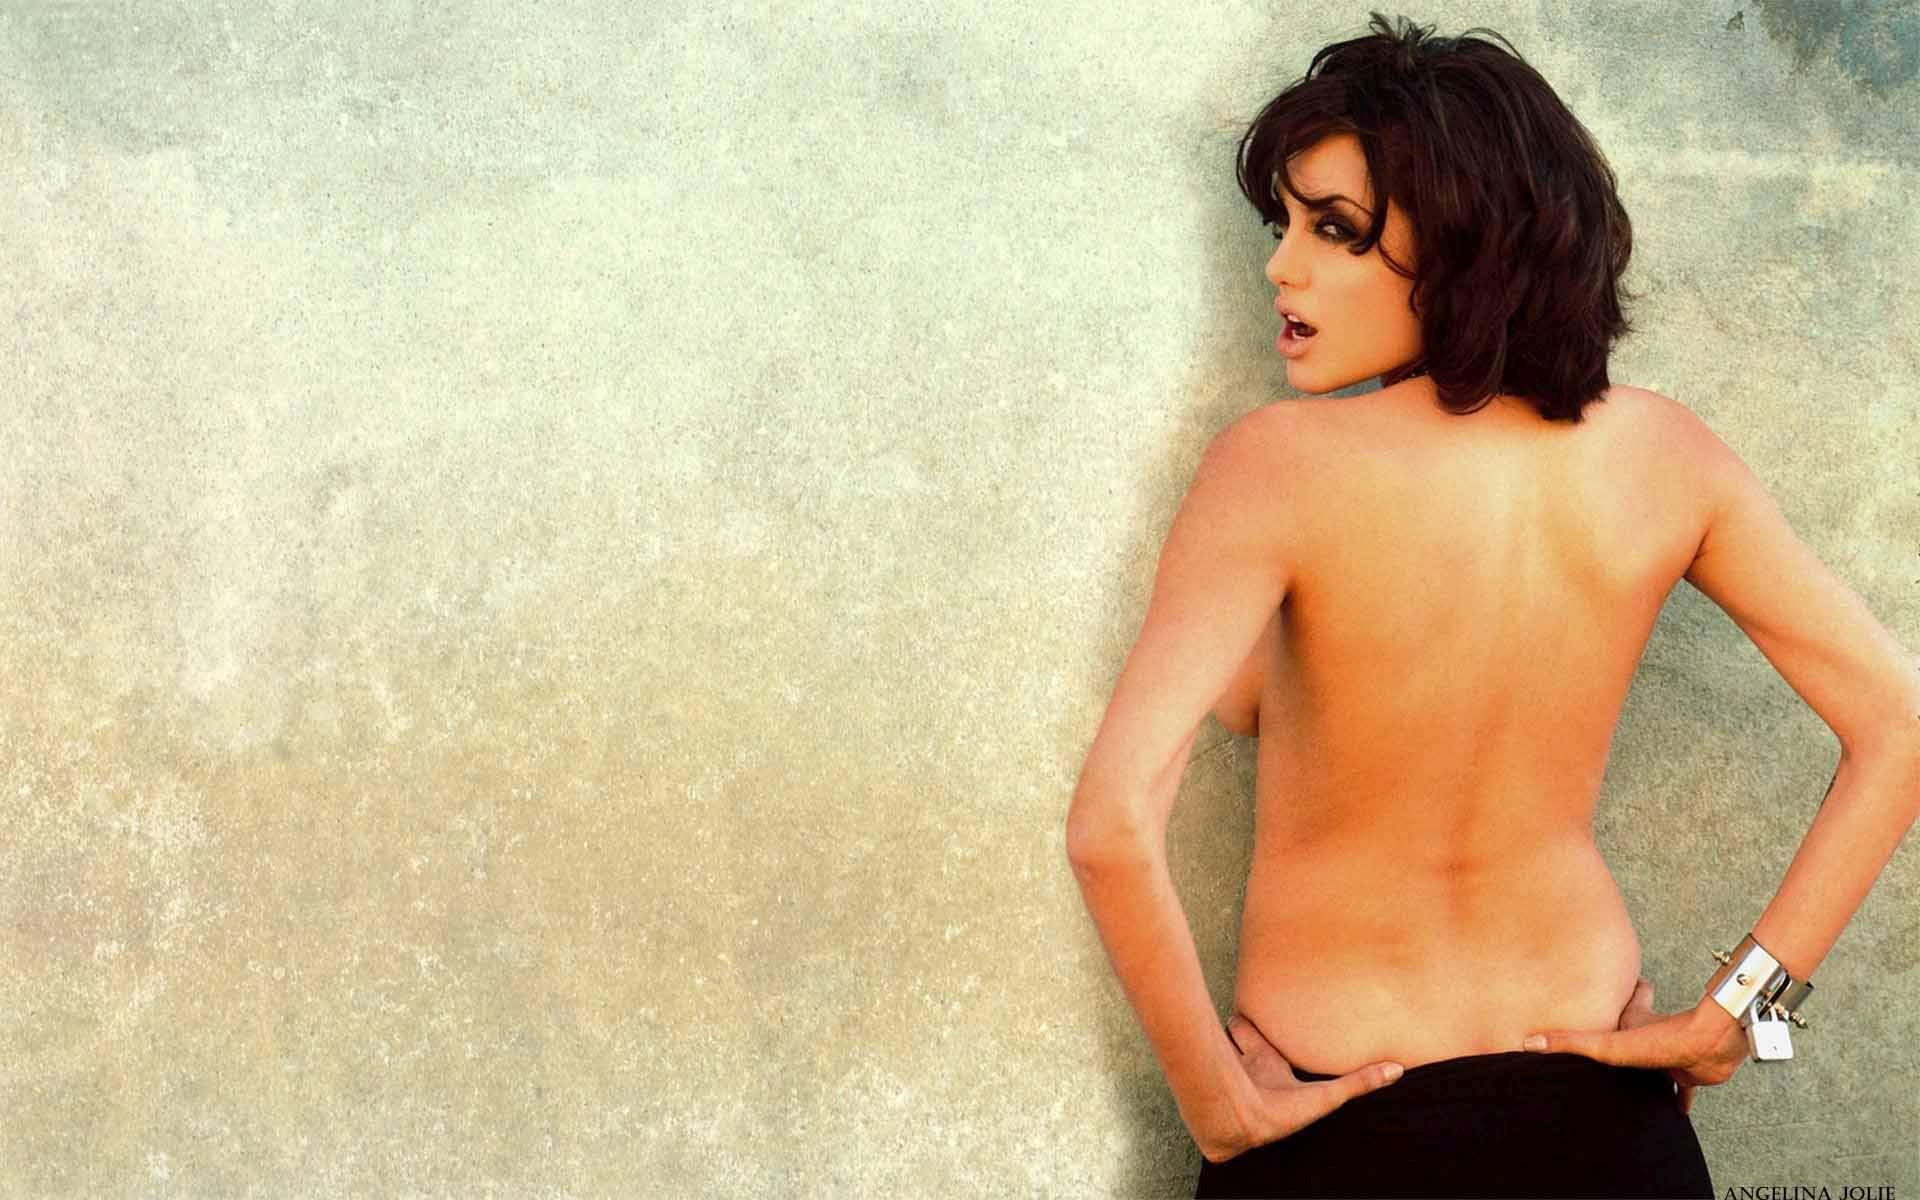 Angelina Jolie Nipples Naked